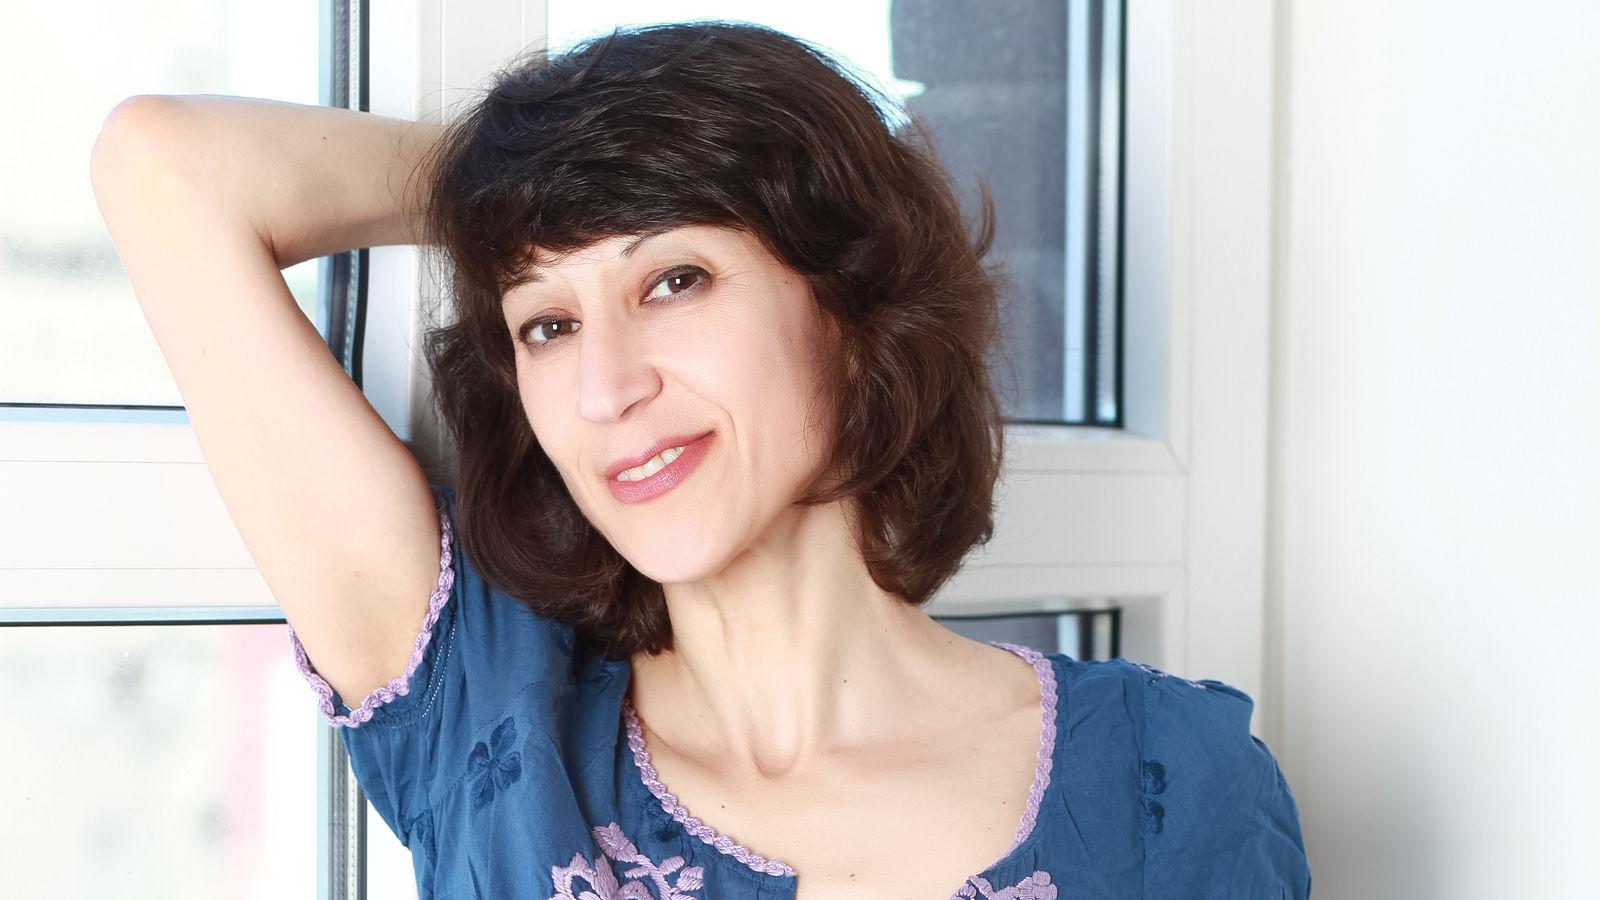 Ammillia's Profile Image